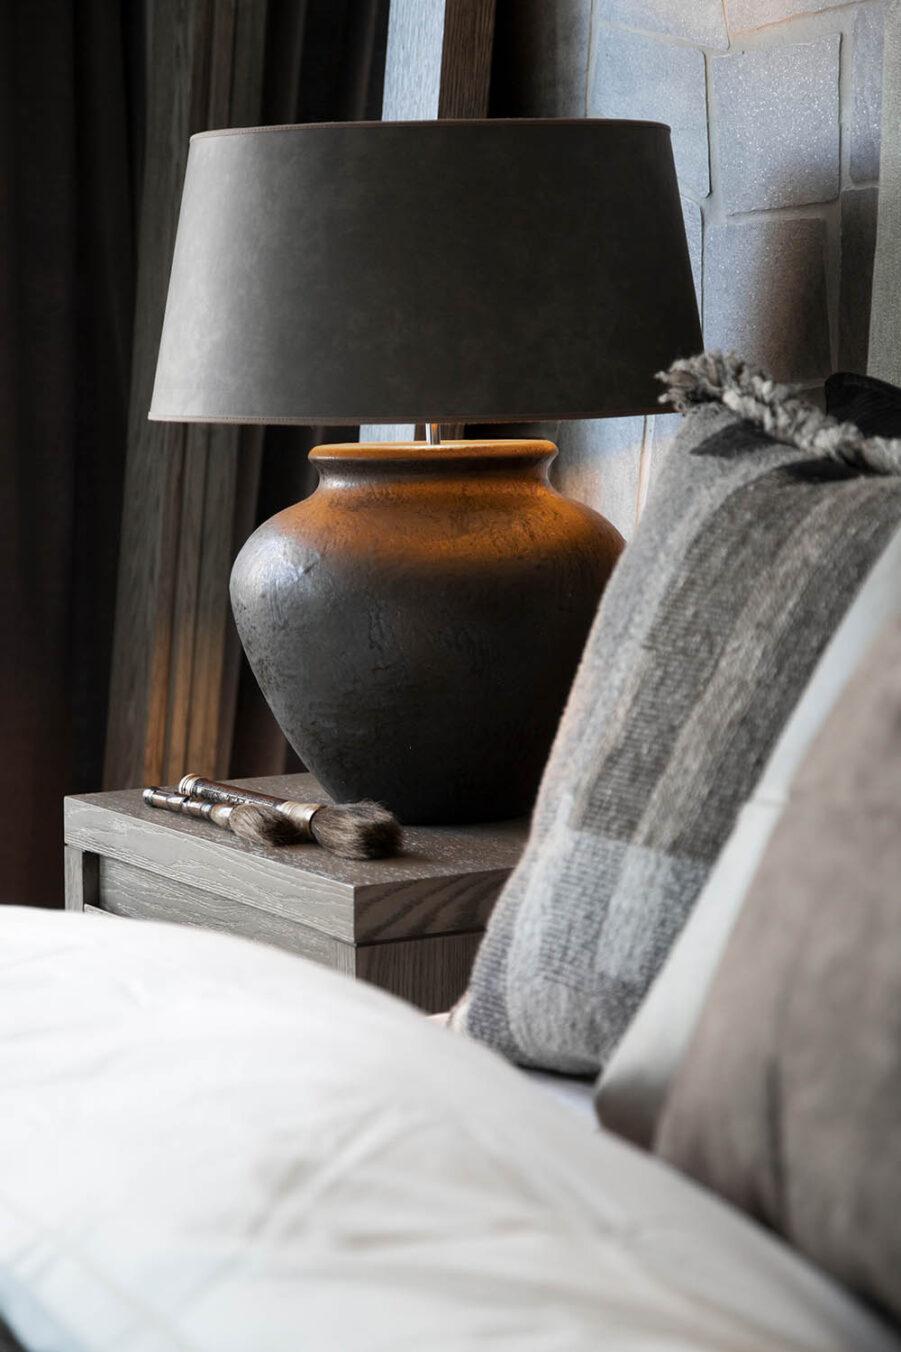 Miljöbild Modena bordslampa, Classic taupe lampskärm från artwood